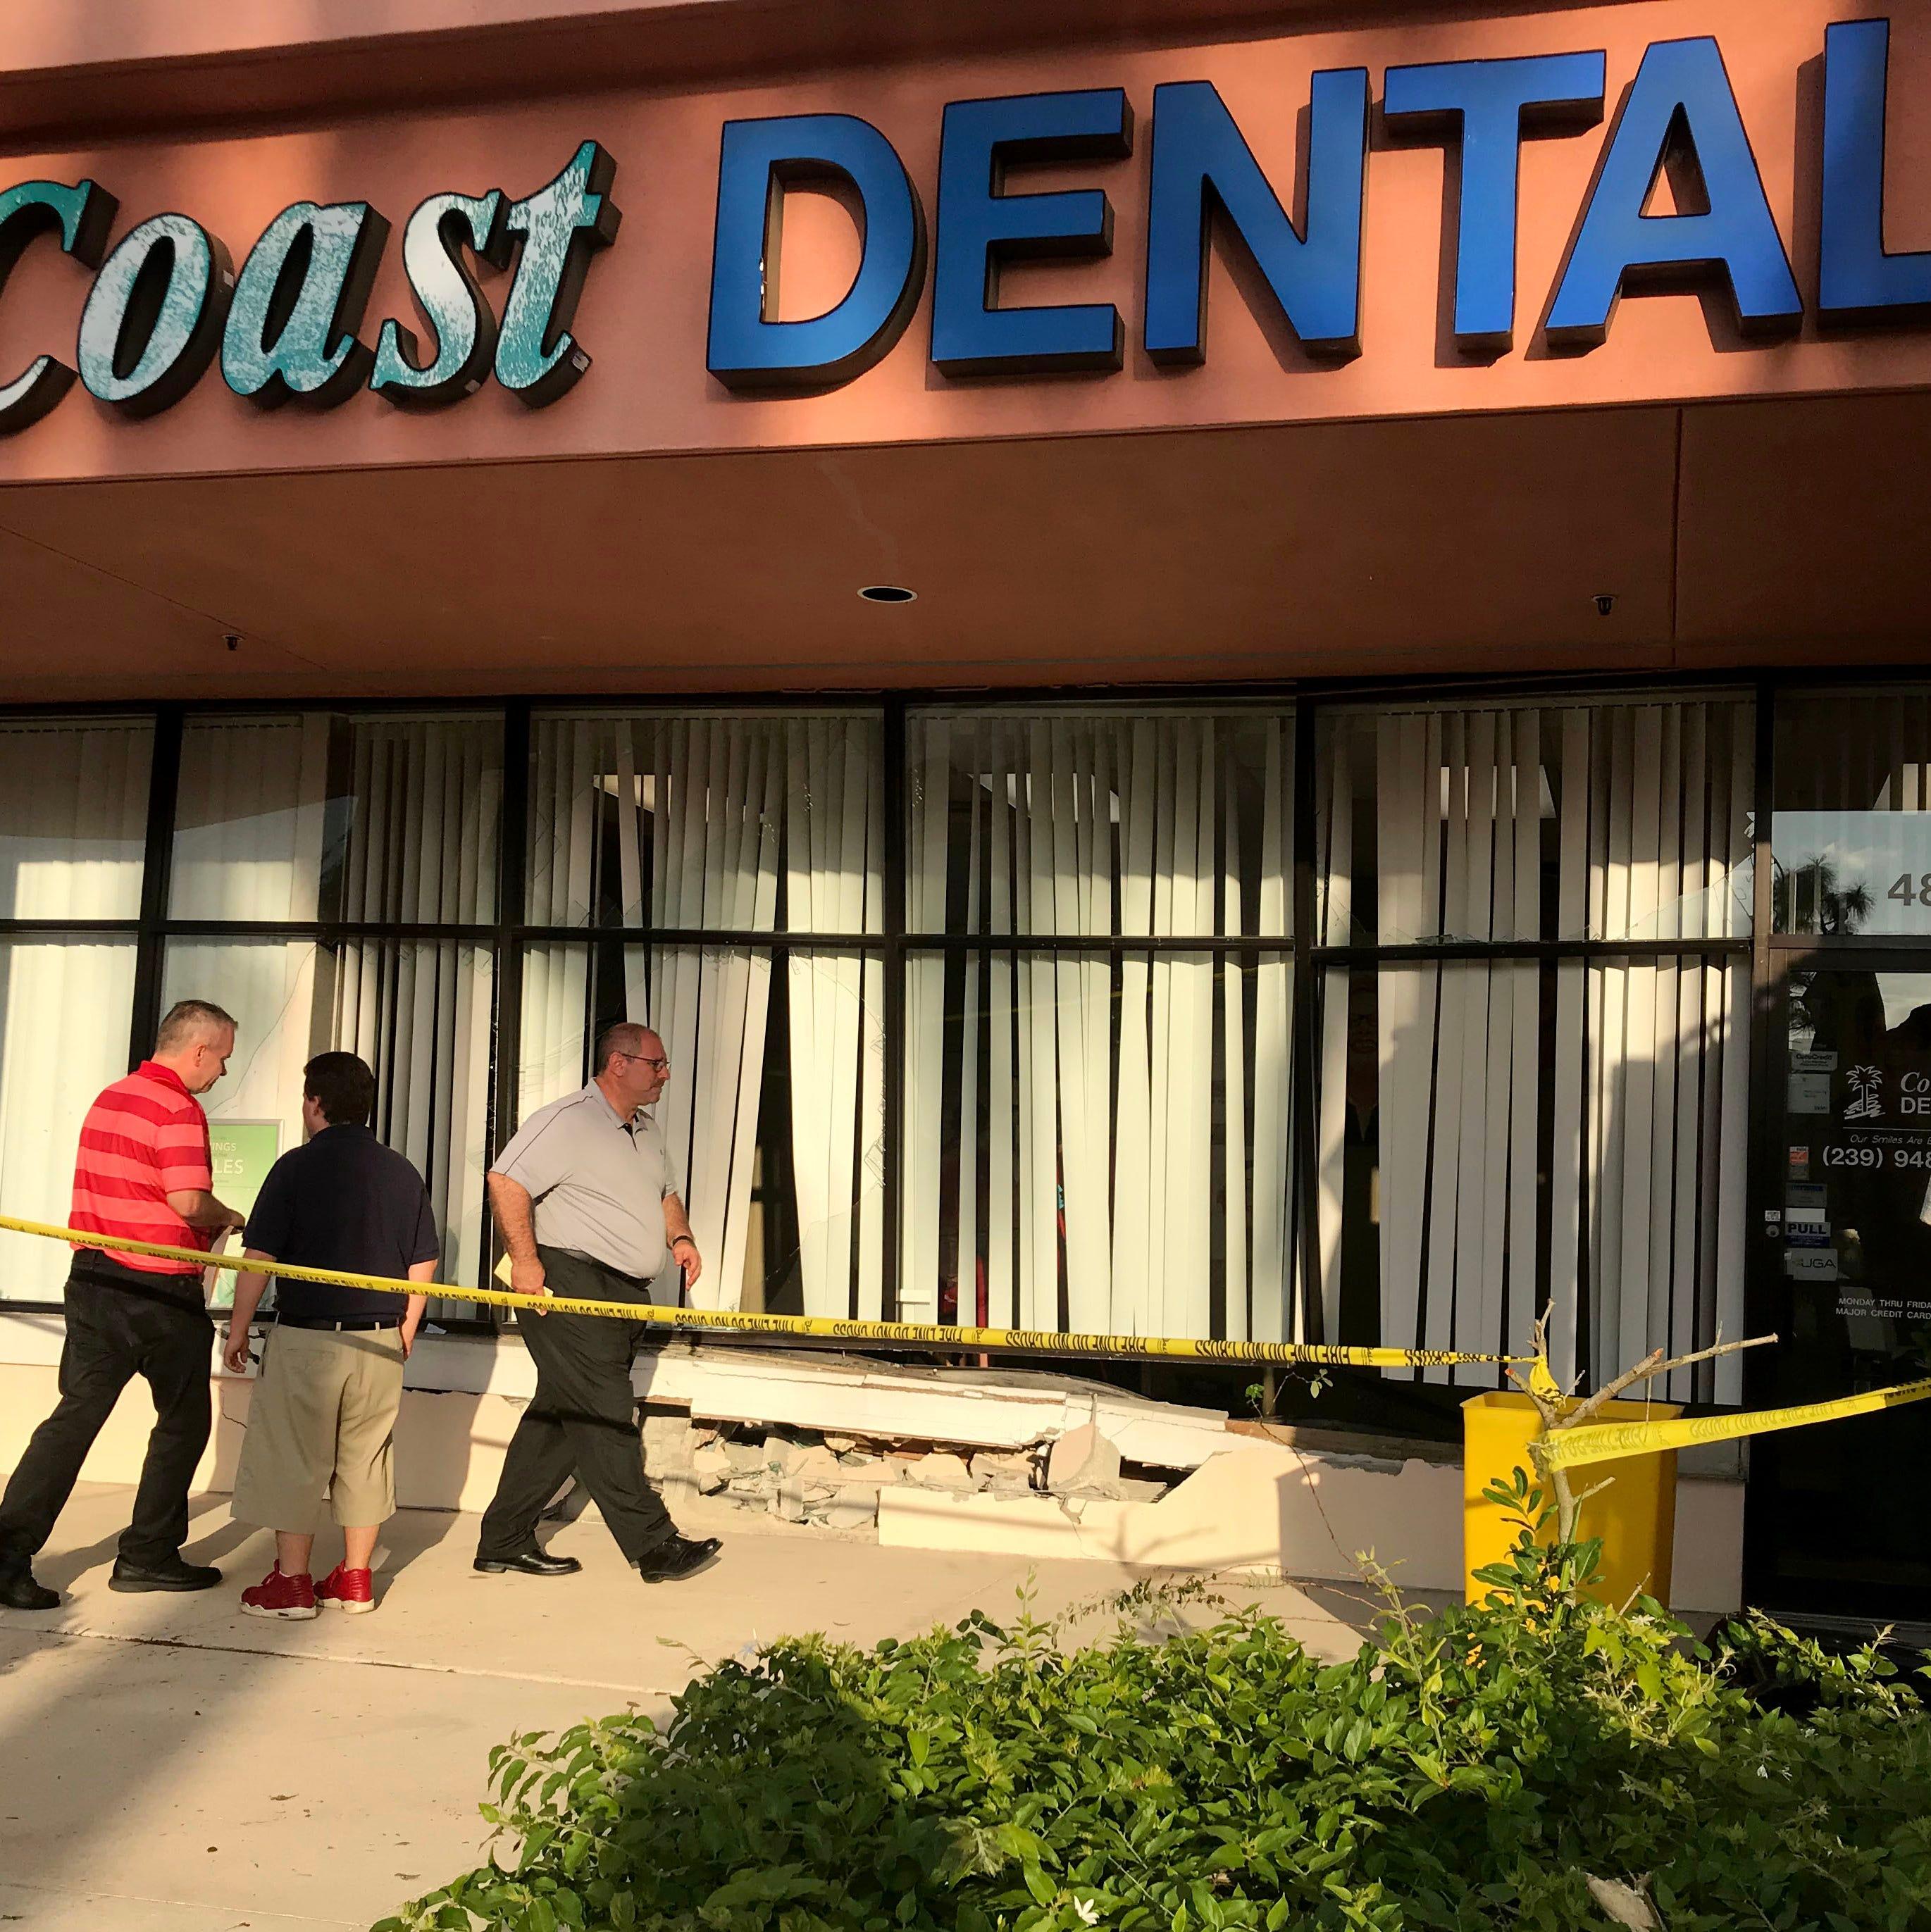 Car crashes into dental office in Bonita Springs; two people injured